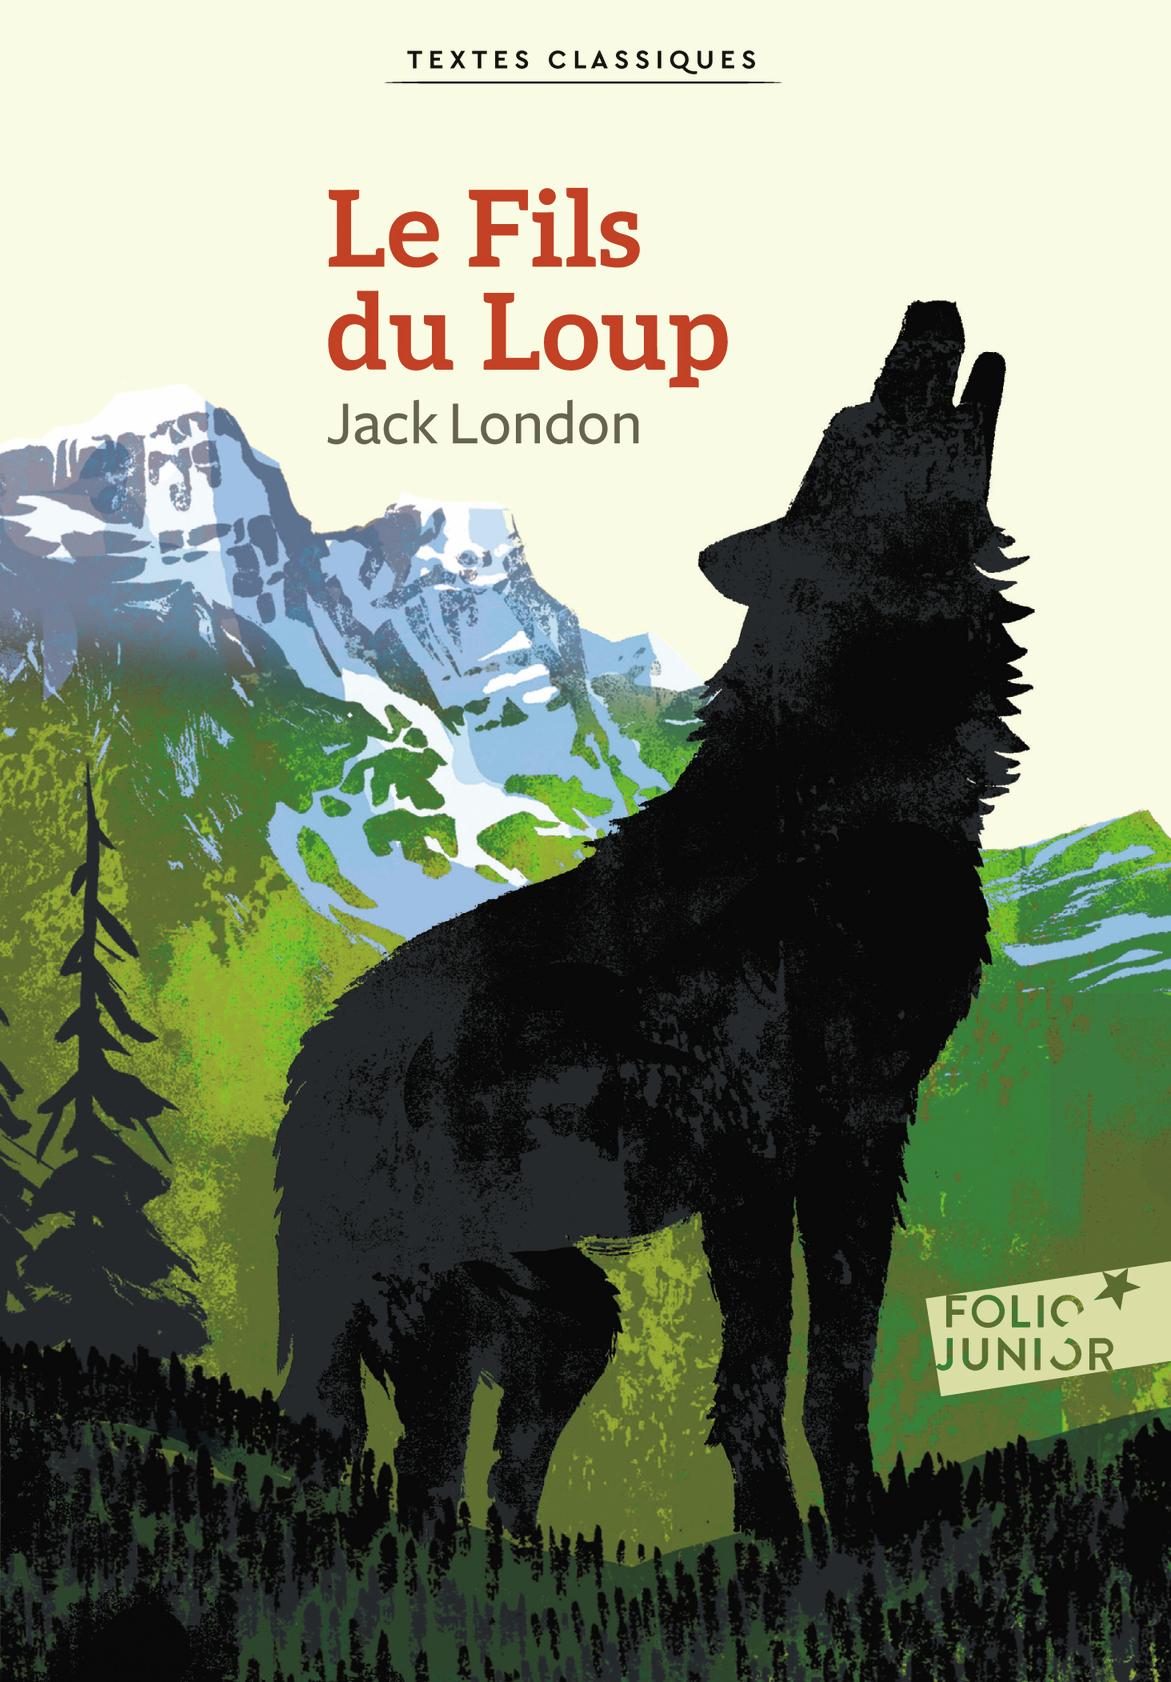 Le Fils du Loup